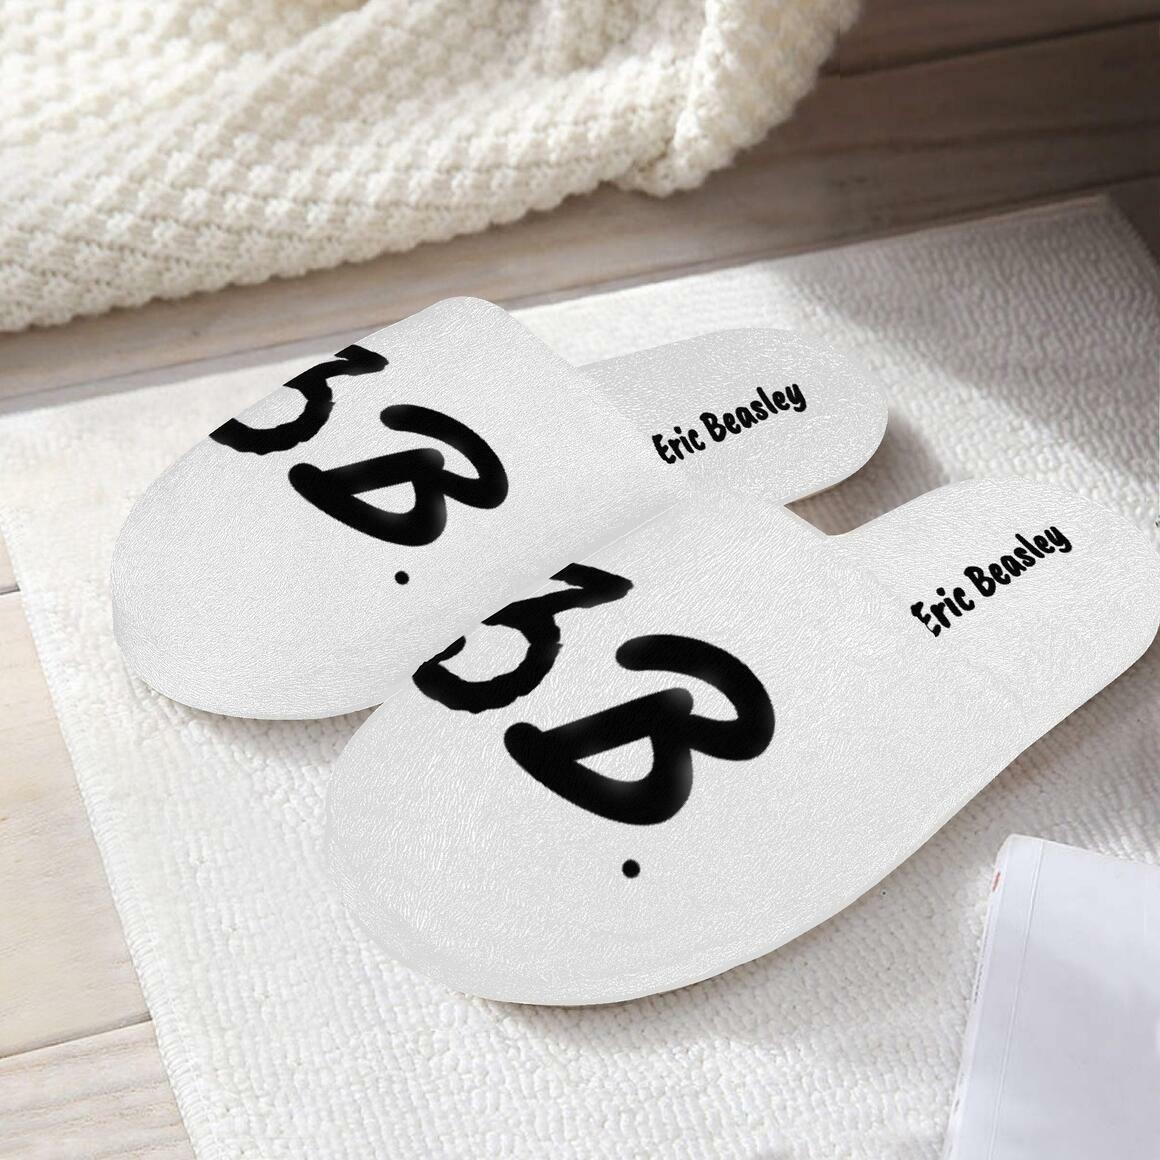 Women 3B Original Slippers - White | Trada Marketplace